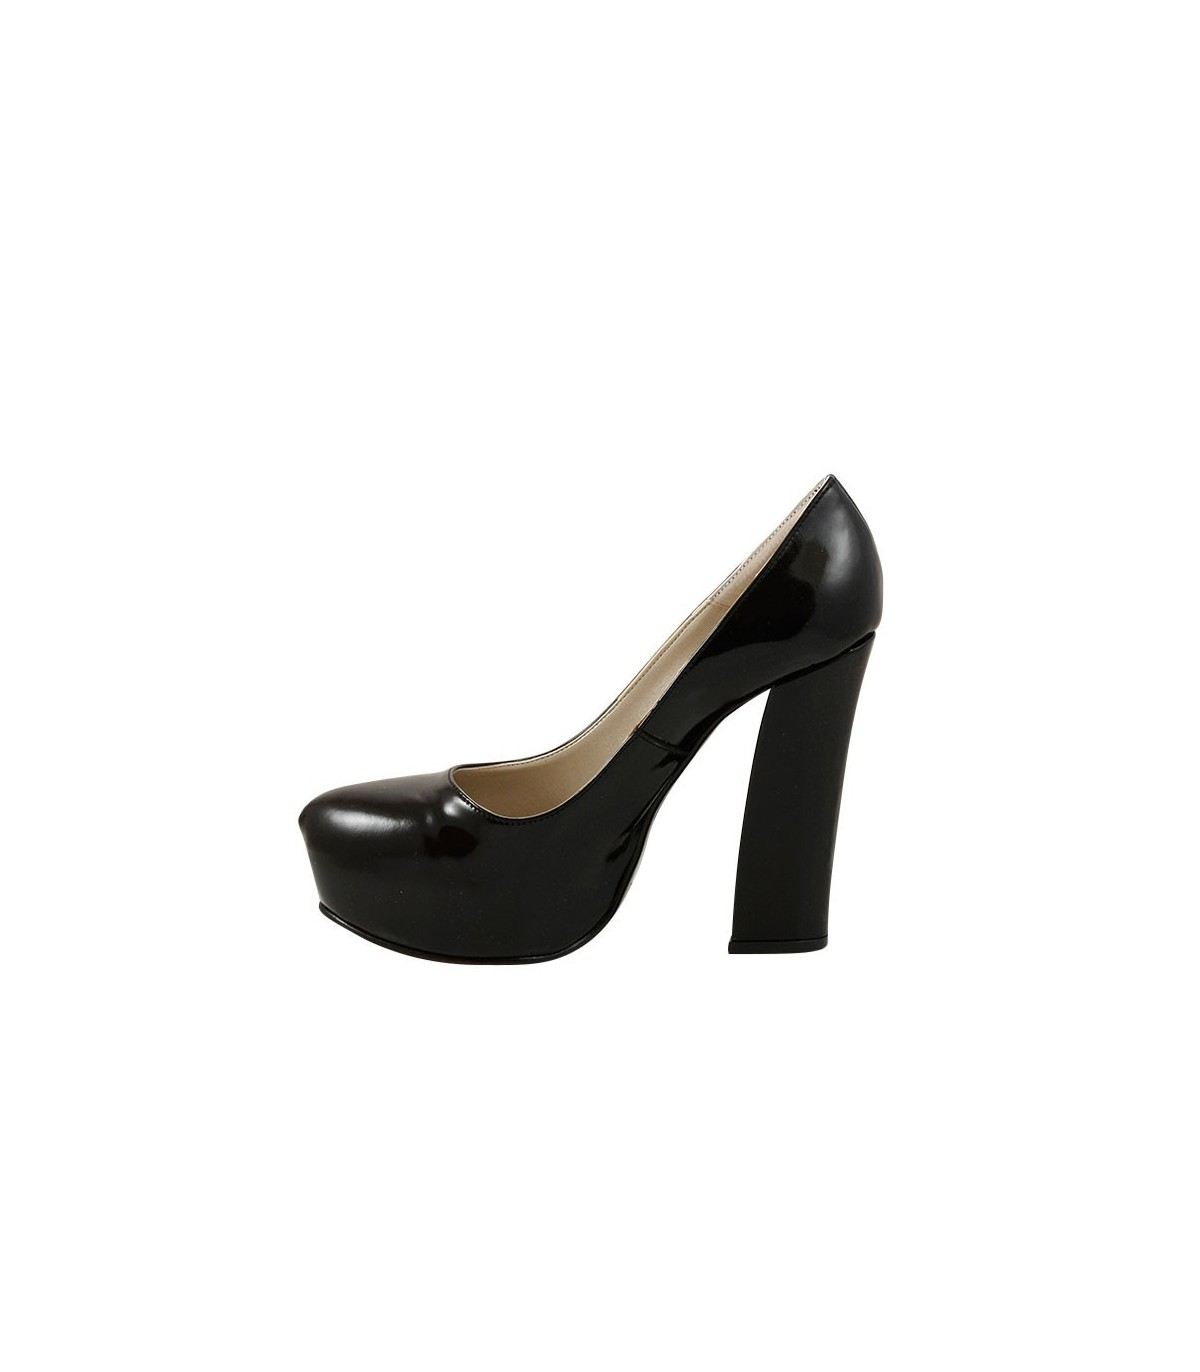 e6fc8cb92a7 ... Stilettos de charol negro. Zapatos de charol